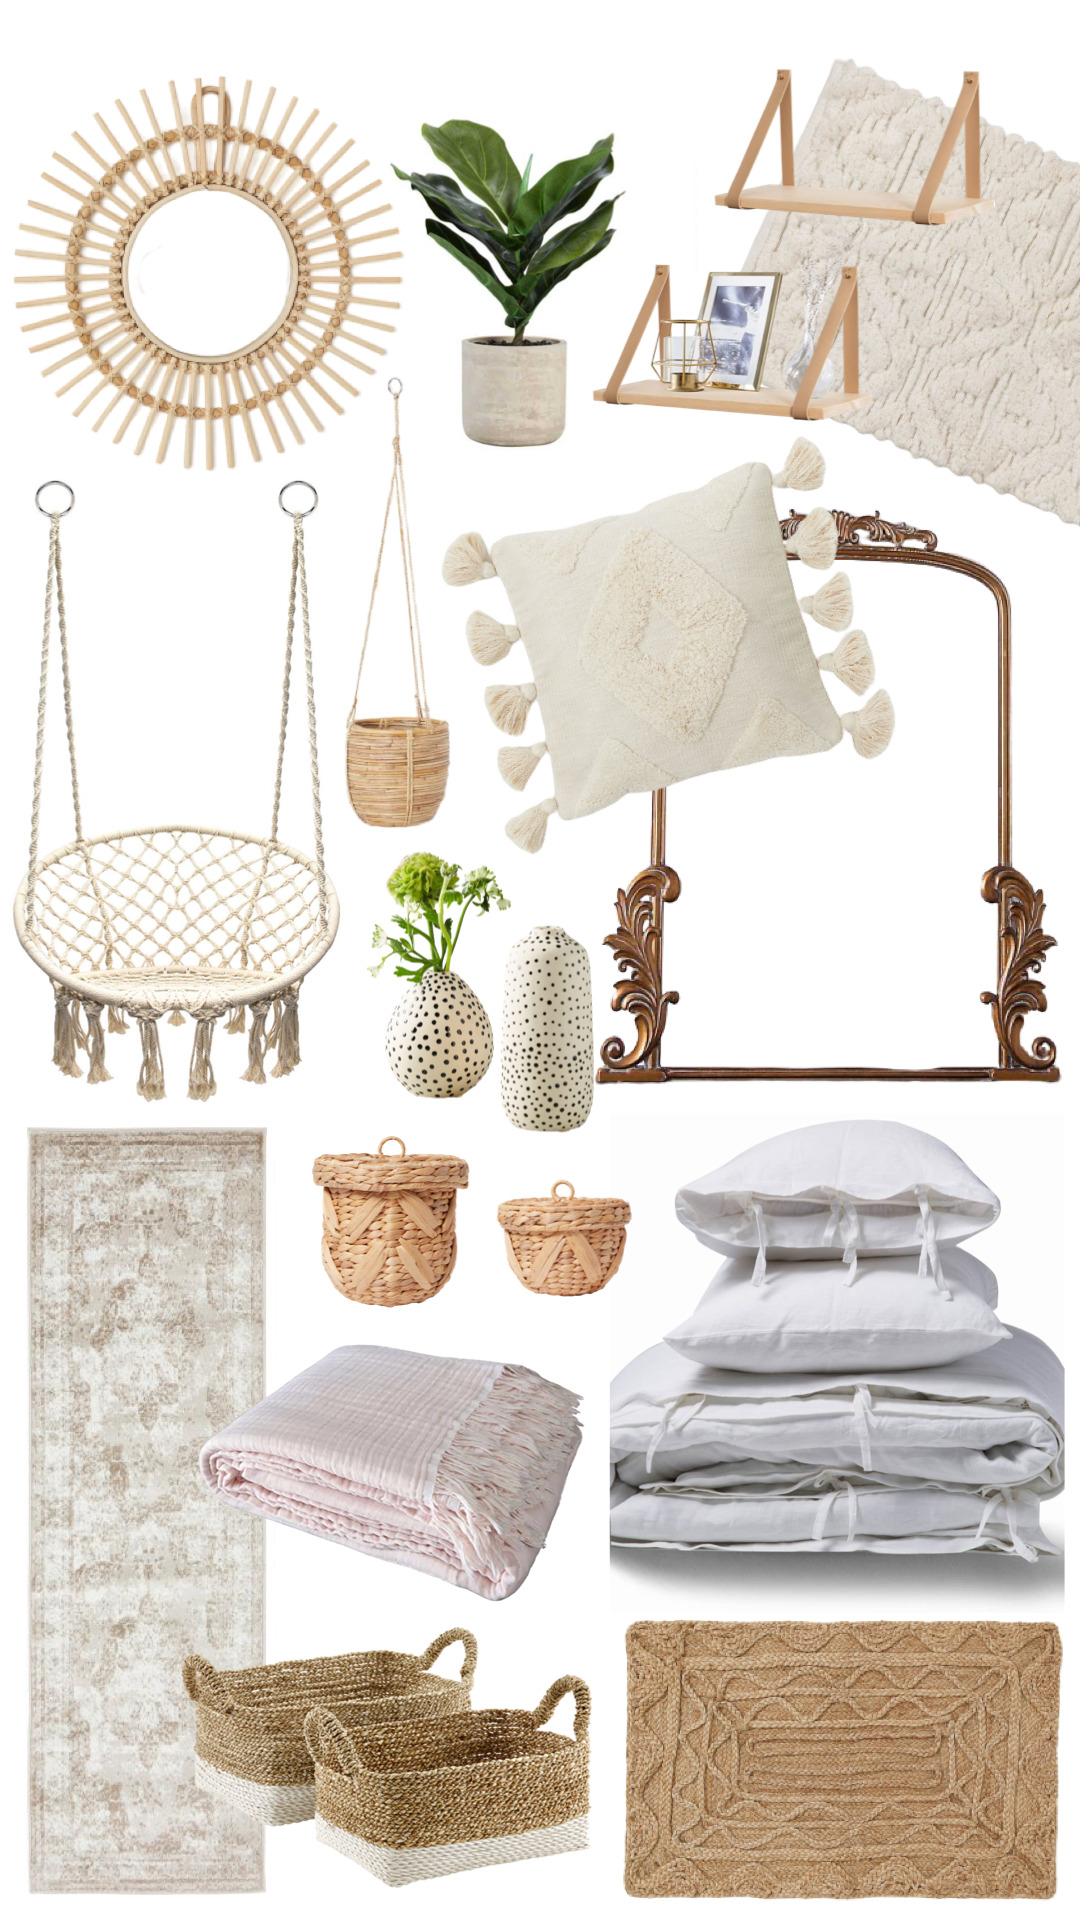 inexpensive house decor ideas